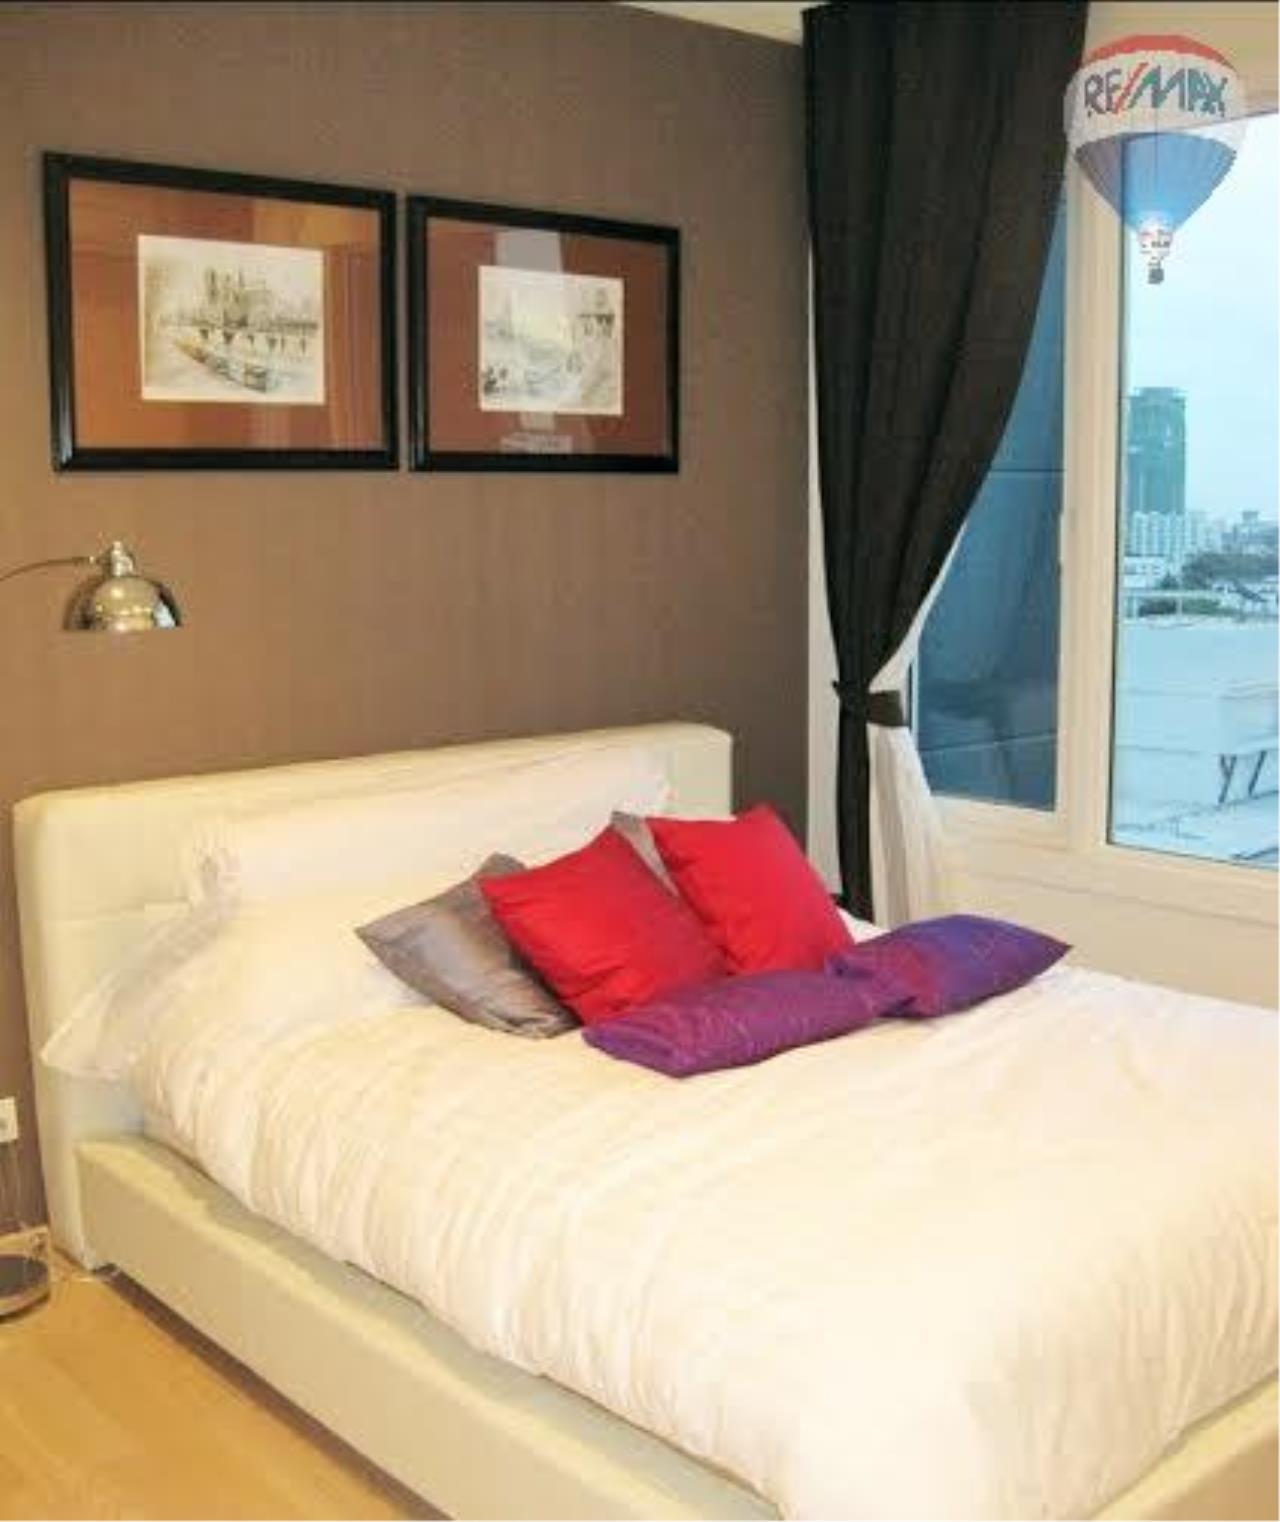 RE/MAX Properties Agency's 2 bedroom 69 Sq.M. for rent at Siri at Sukhumvit  9